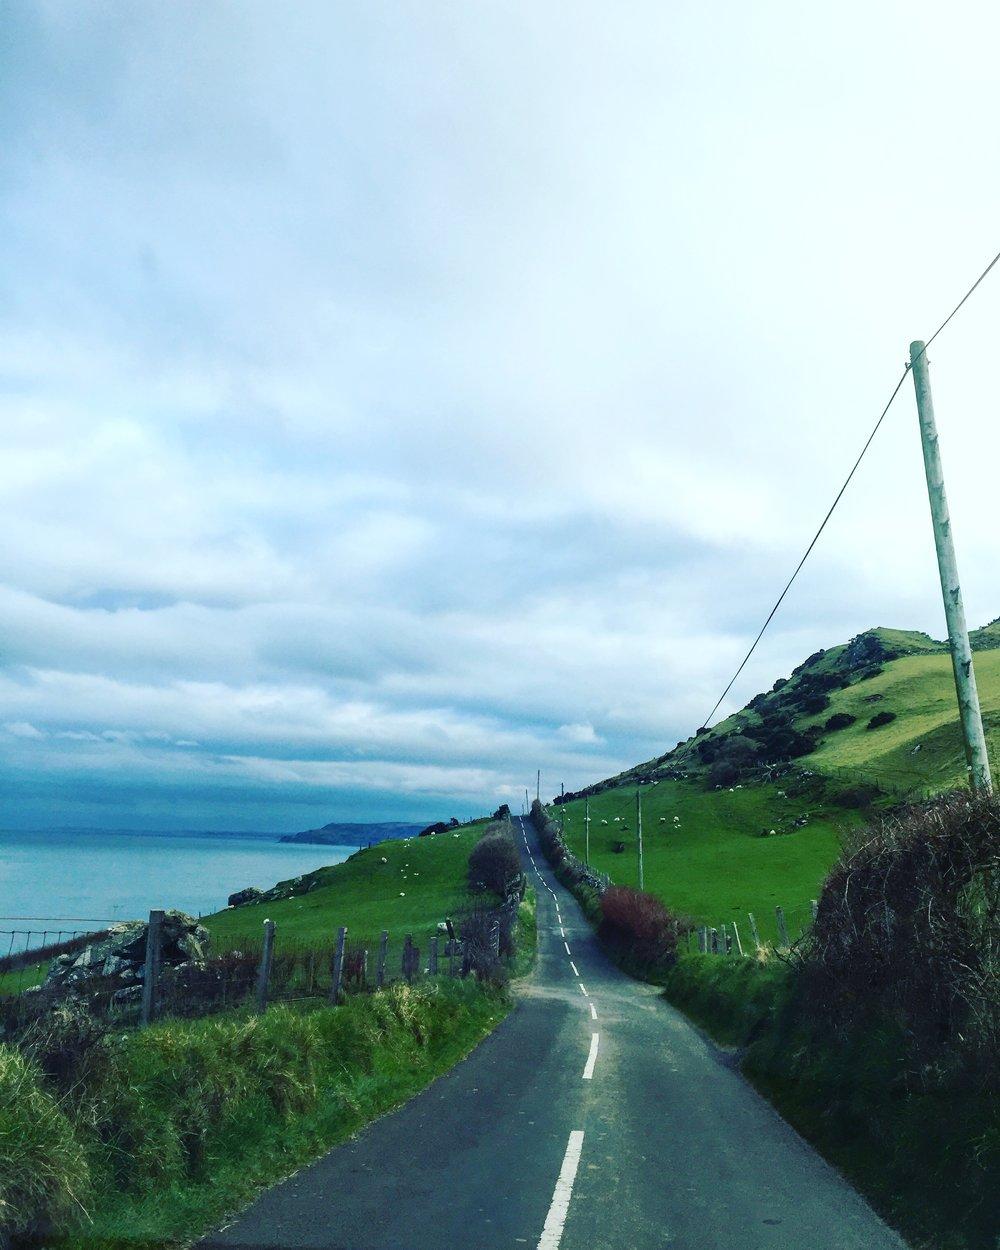 country_road_torr_head_ni_explorer_niexplorer_northern_ireland_blog.jpg